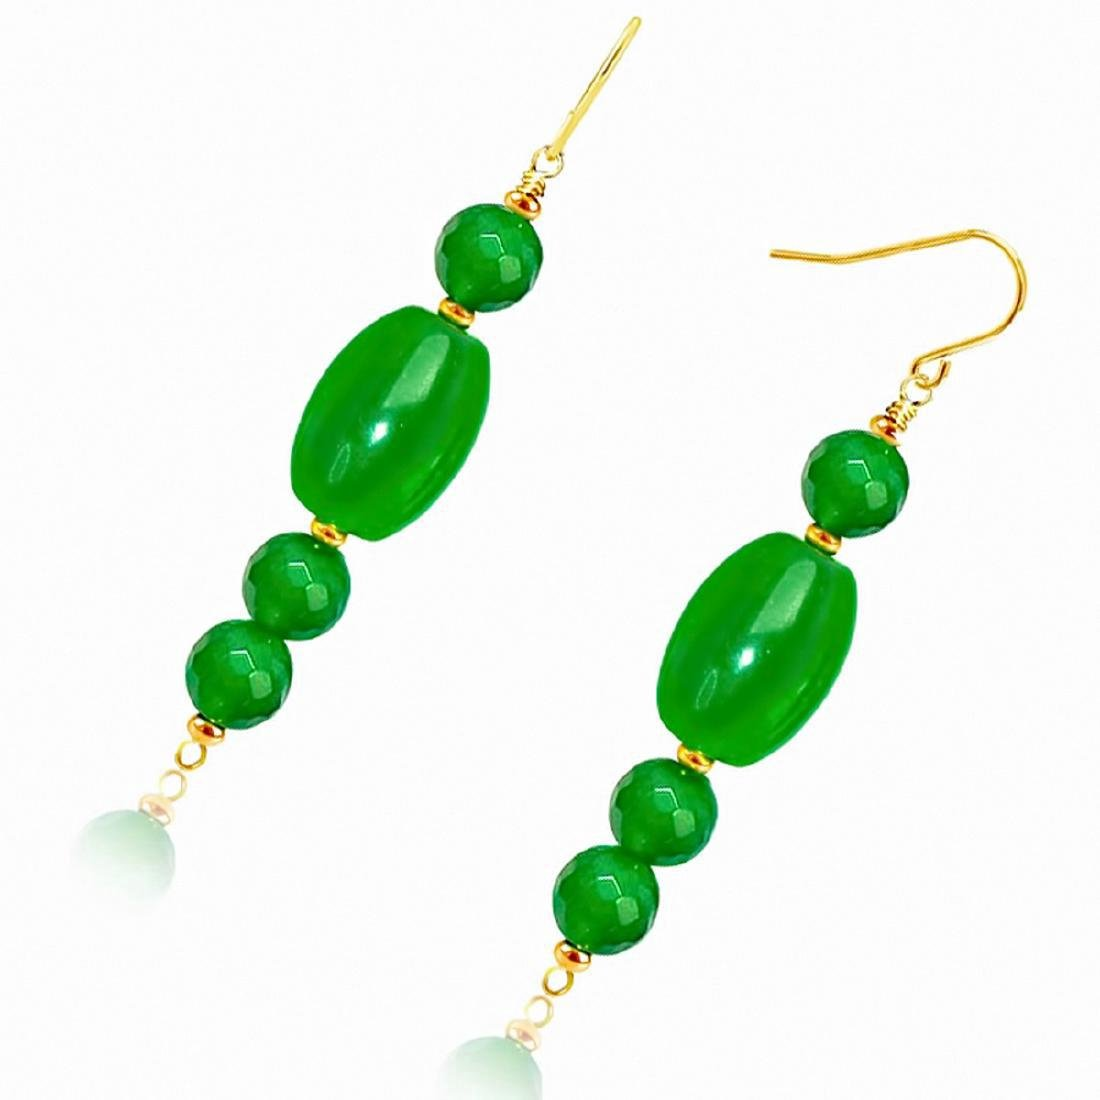 14kt Gold Drop Imperial Jade Earrings - 3